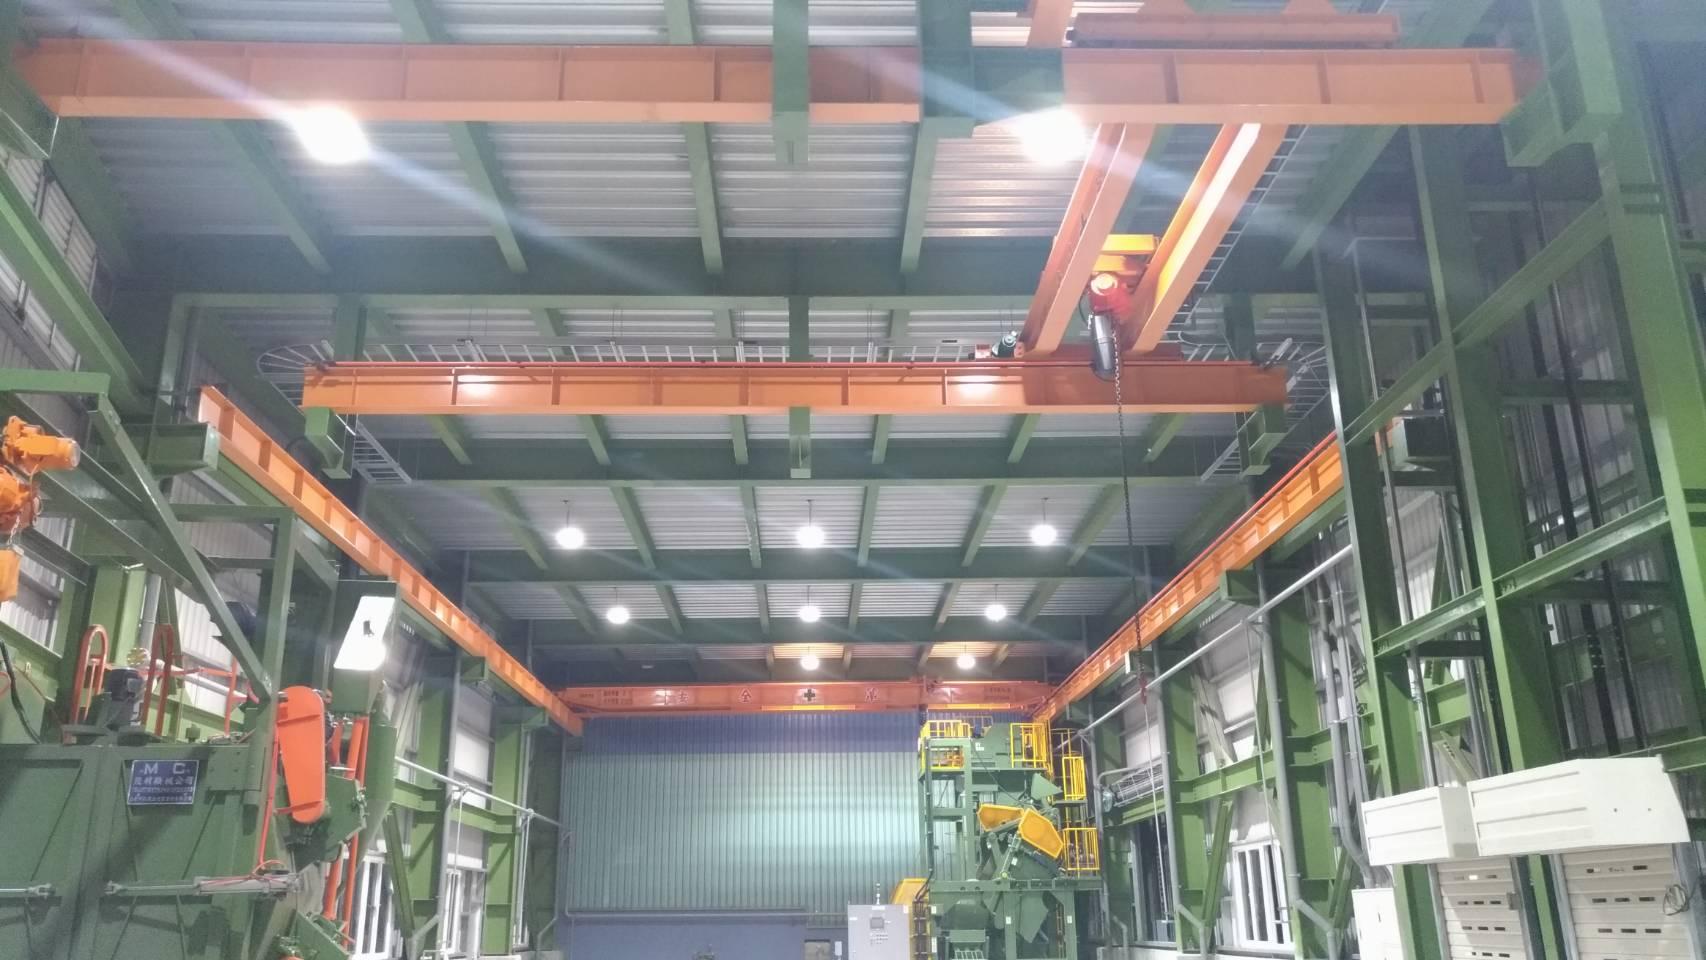 新北LED 天井燈,LED廠房燈,LED工礦燈製造,LED燈泡